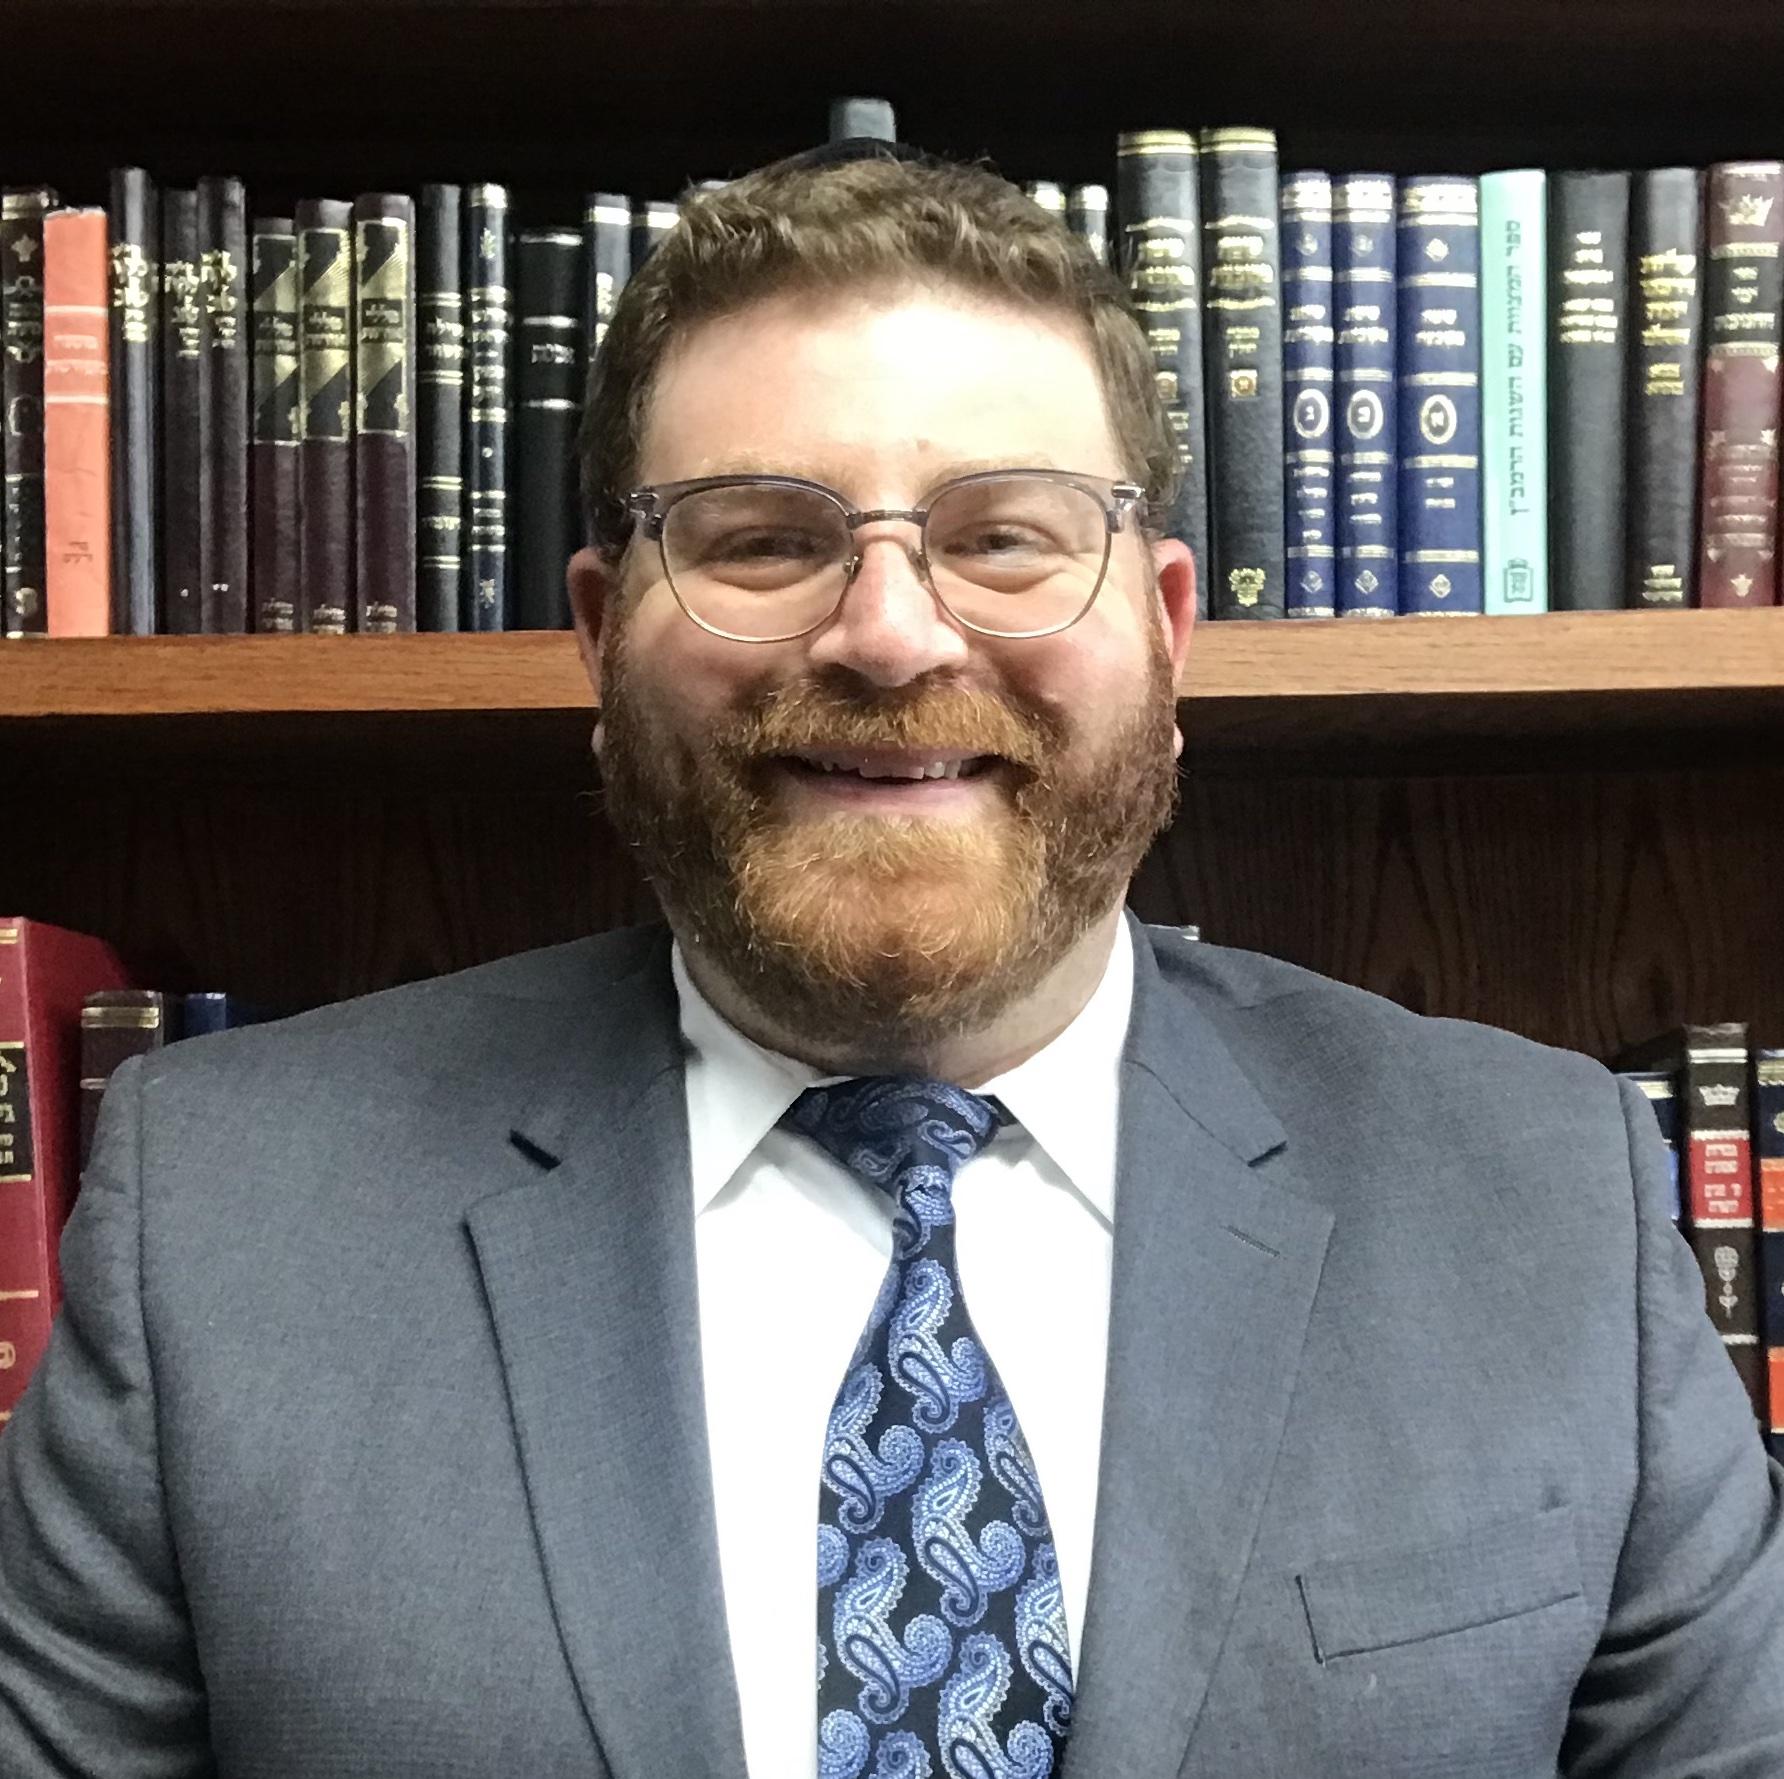 Rabbi Reuven Glucksman